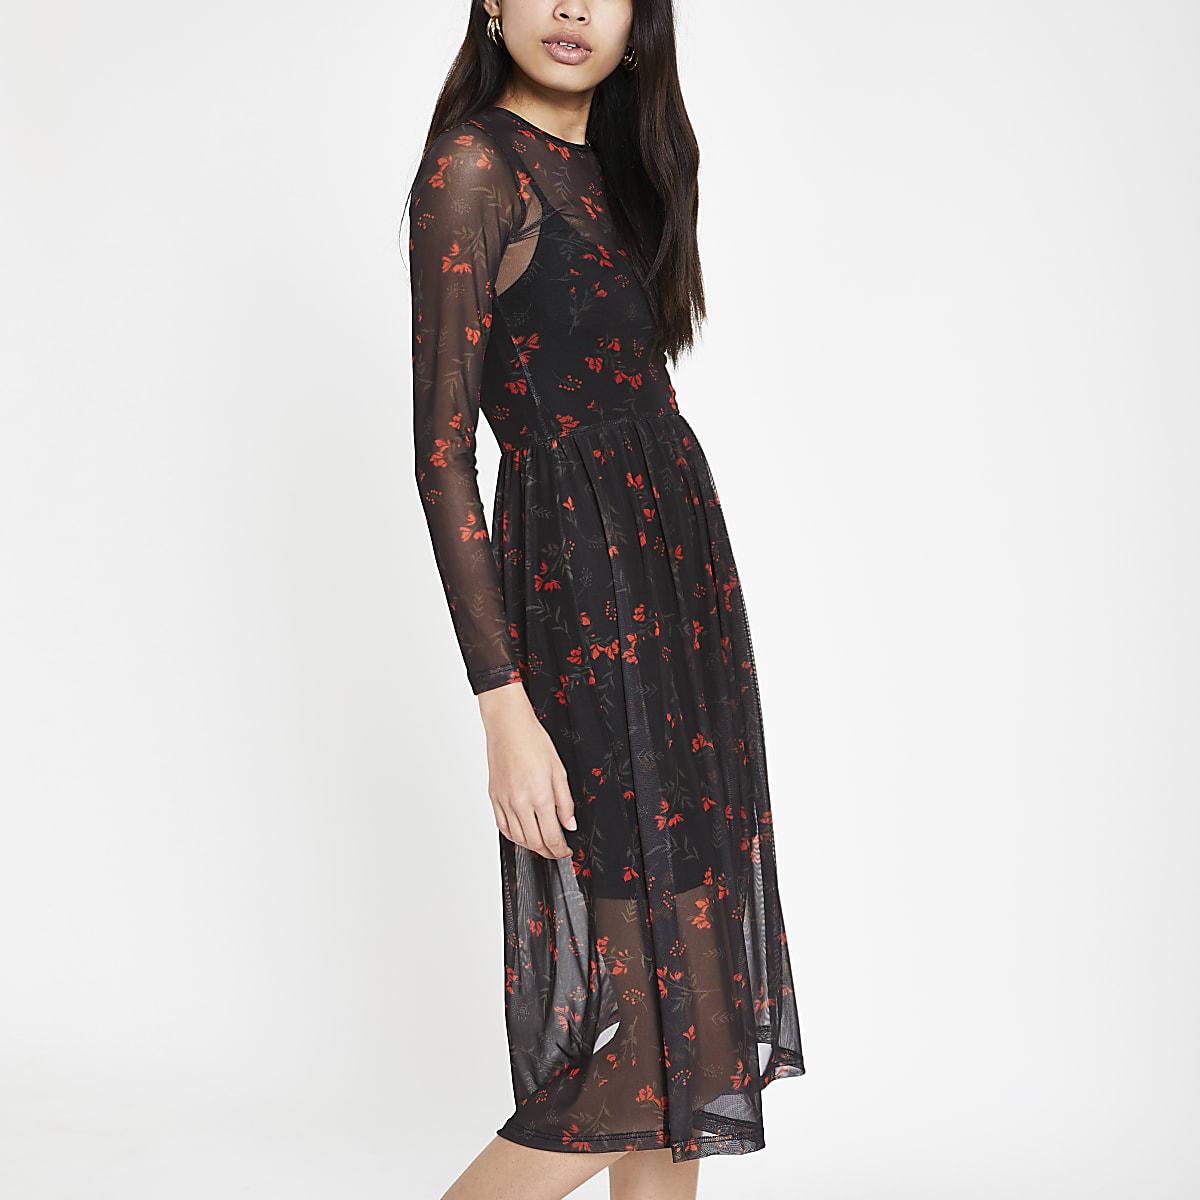 Black floral mesh midi dress